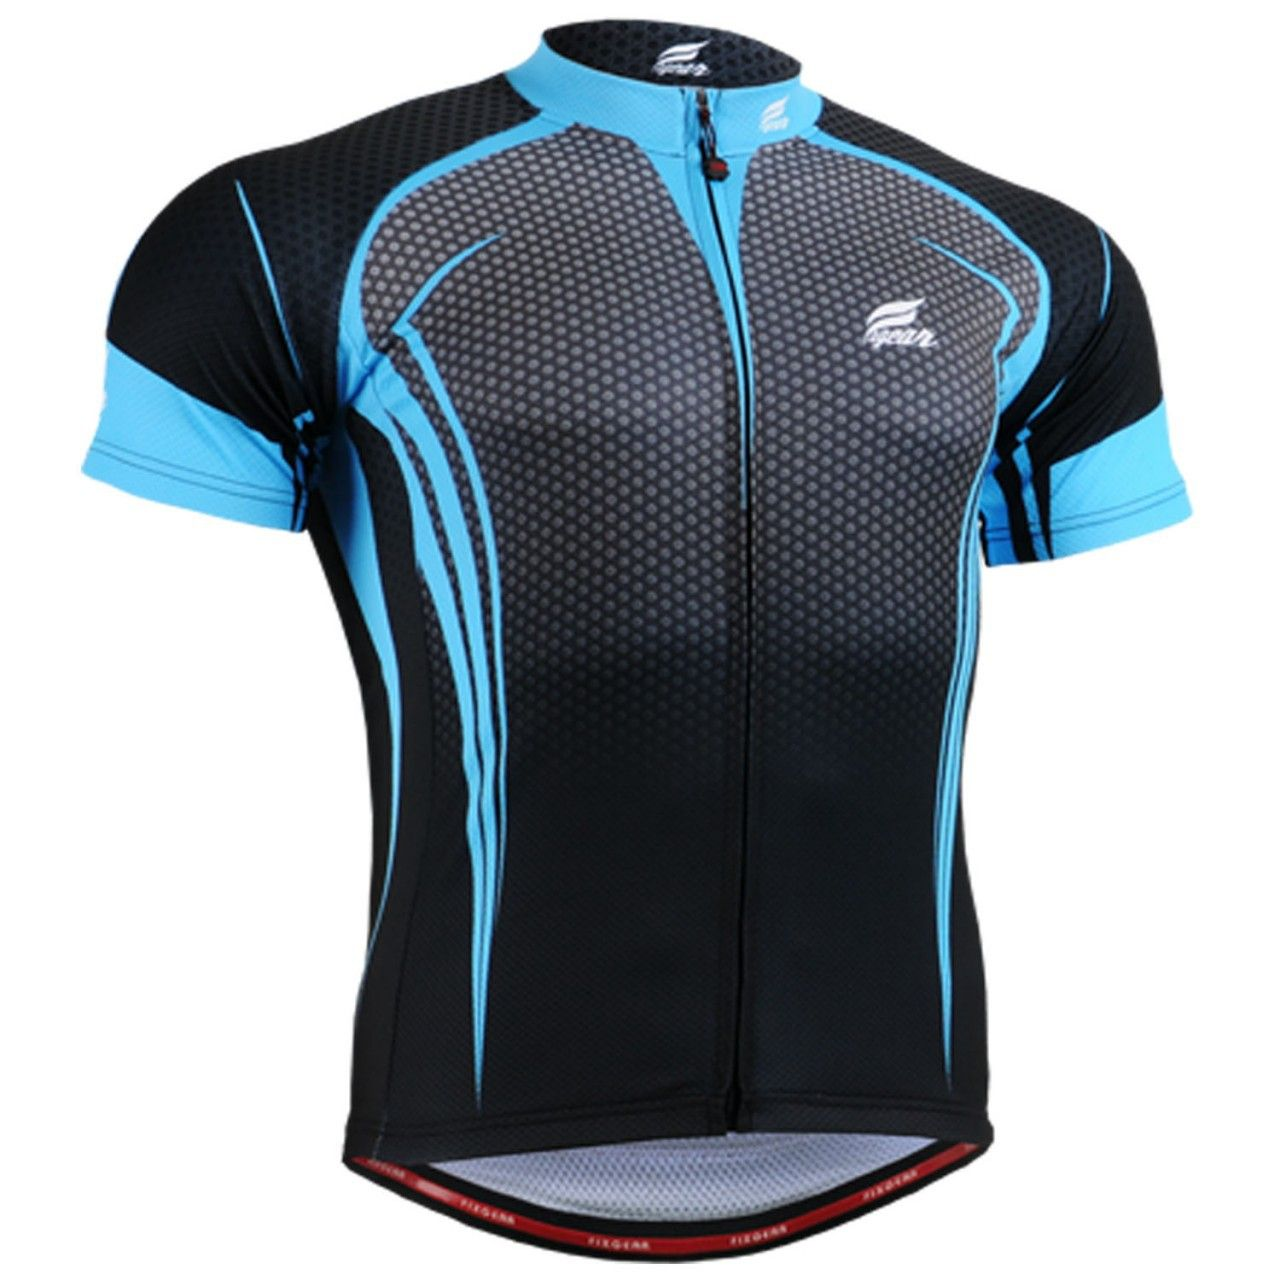 Fixgear Cycling Jersey Best Bike Wear Biking Shirt For Men S 3xl